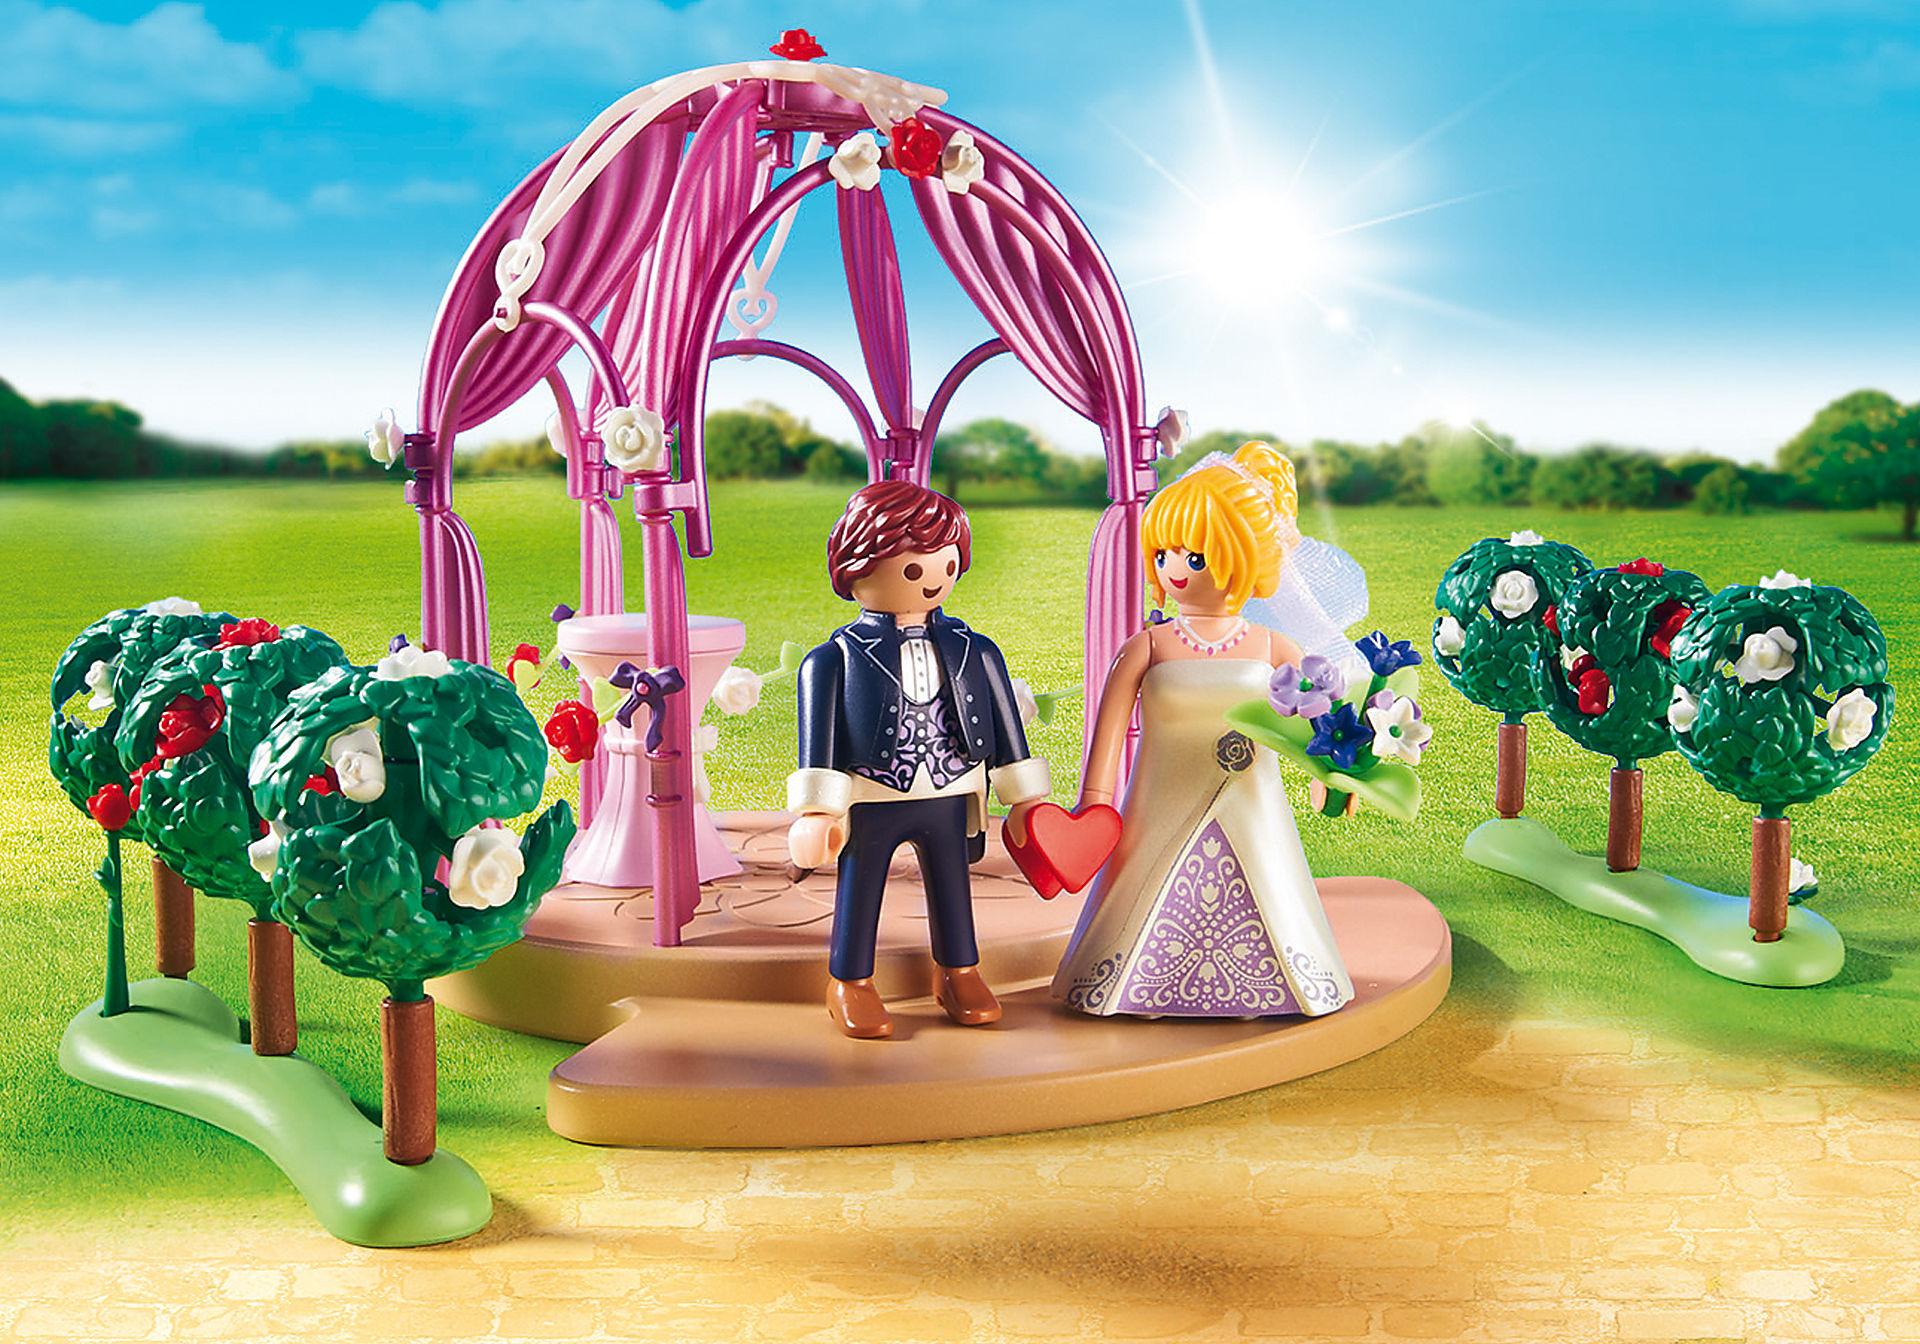 http://media.playmobil.com/i/playmobil/9229_product_extra1/Hochzeitspavillon mit Brautpaar